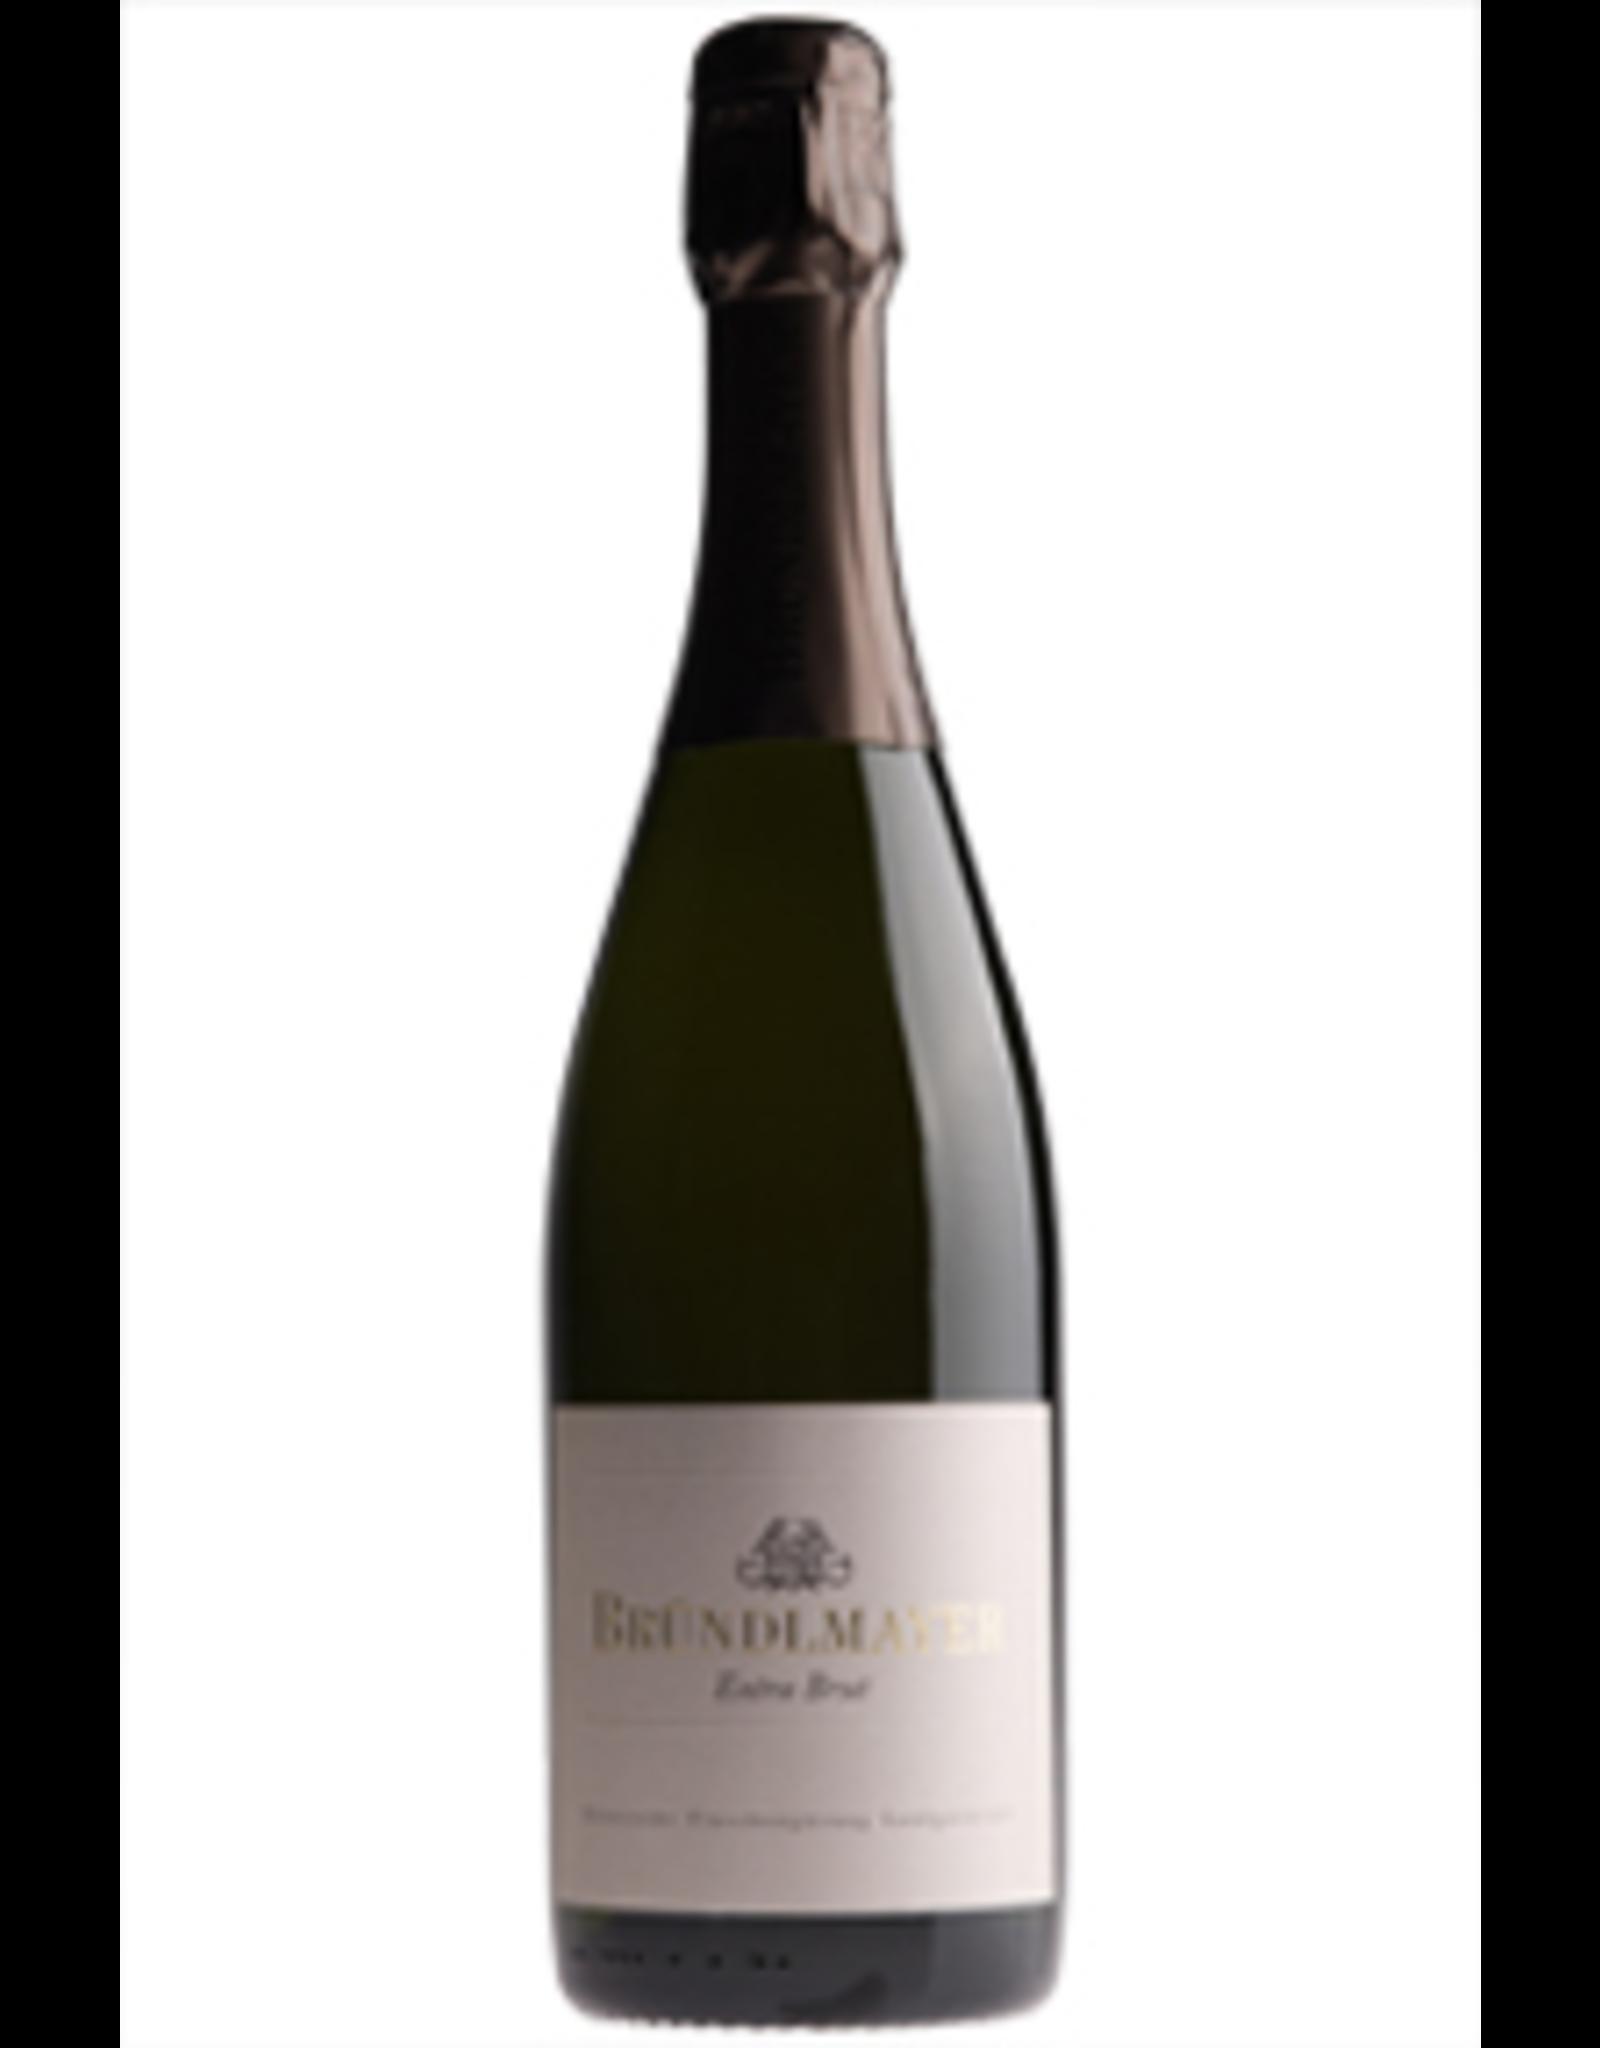 Sparkling Wine 2015, Weingut Willi Brundlmayer Extra Brut, Sparkling Wine, Kamptal, Langenlois, Austria, 12% Alc, TW93